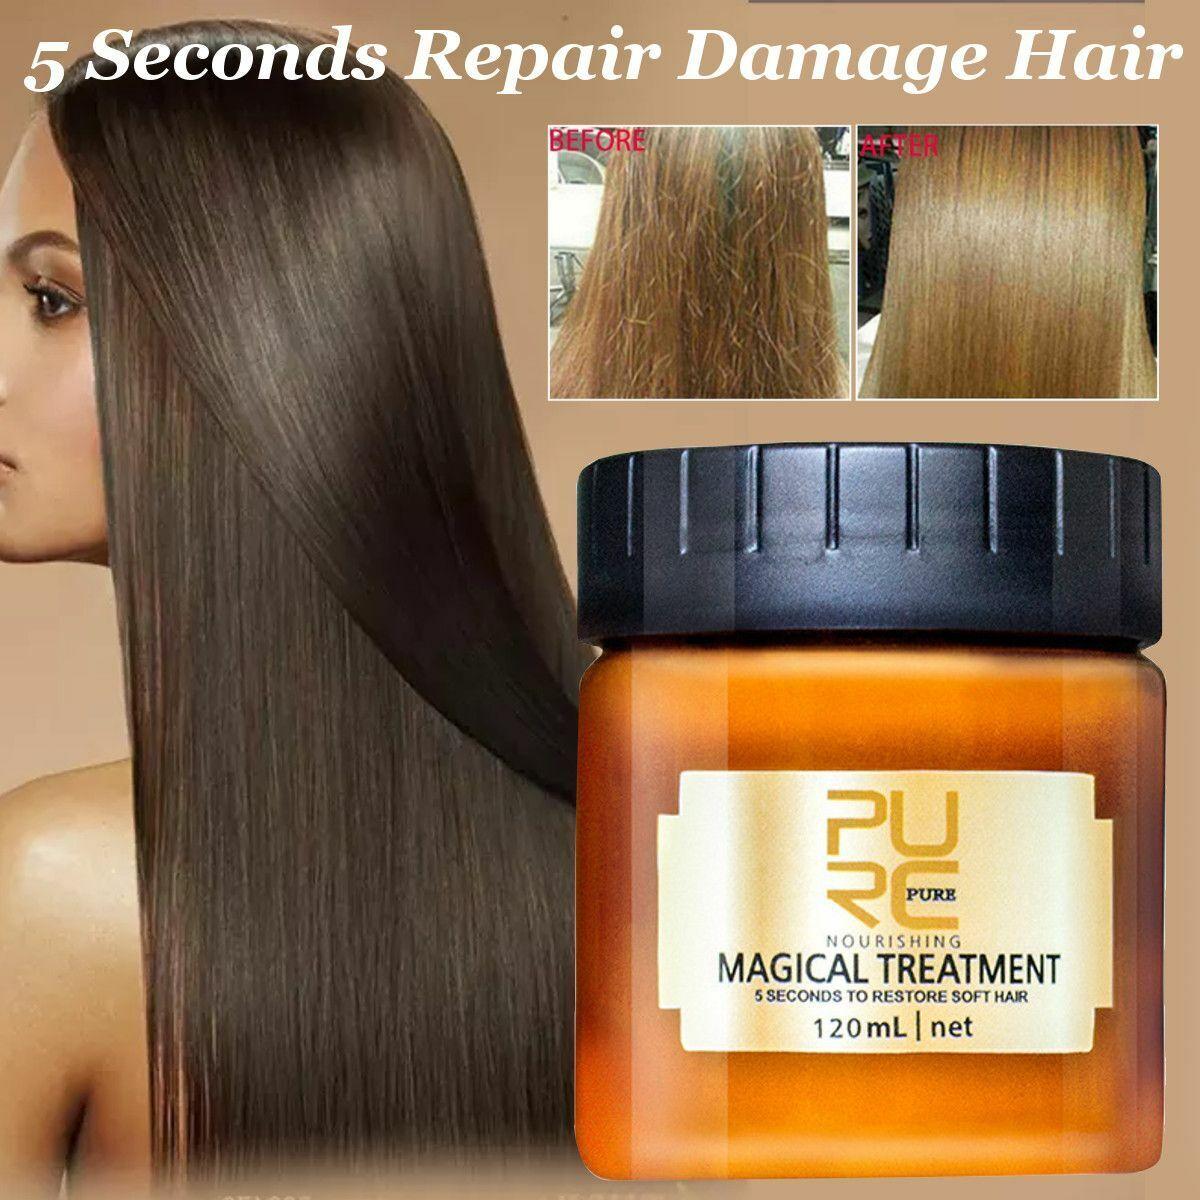 PURC Magical Treatment Mask 5 Seconds Repairs Damage Restore Soft Hair 60 120mL